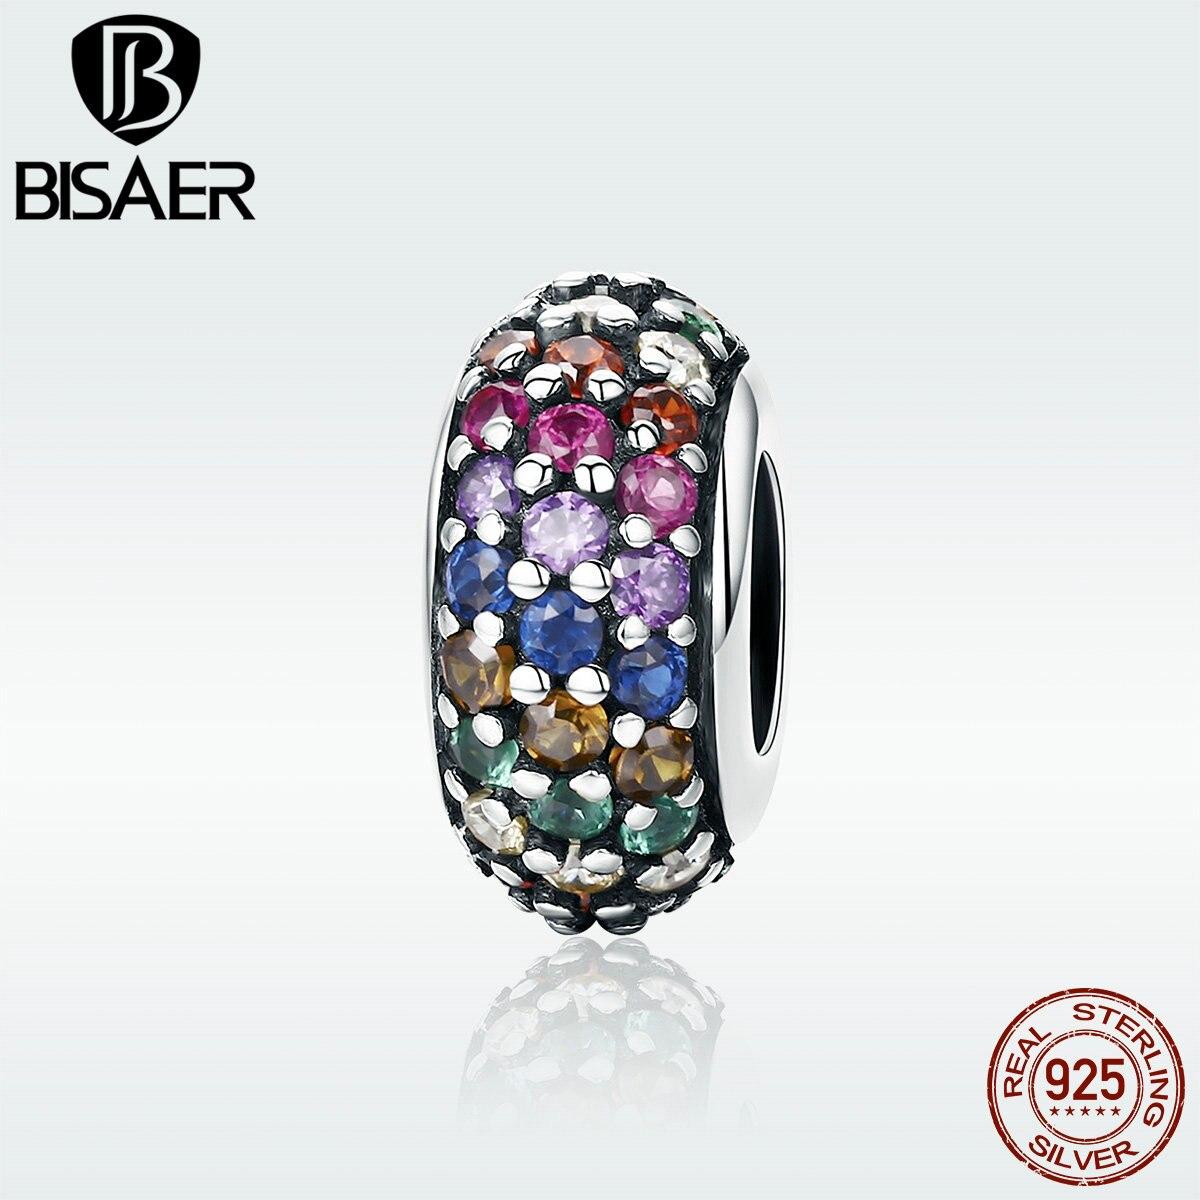 BISAER Hohe Qualität 925 Sterling Silber Spacer Über die Regenbogen CZ Perlen fit Charme Armband & Armreifen 925 Silber Schmuck GXC583